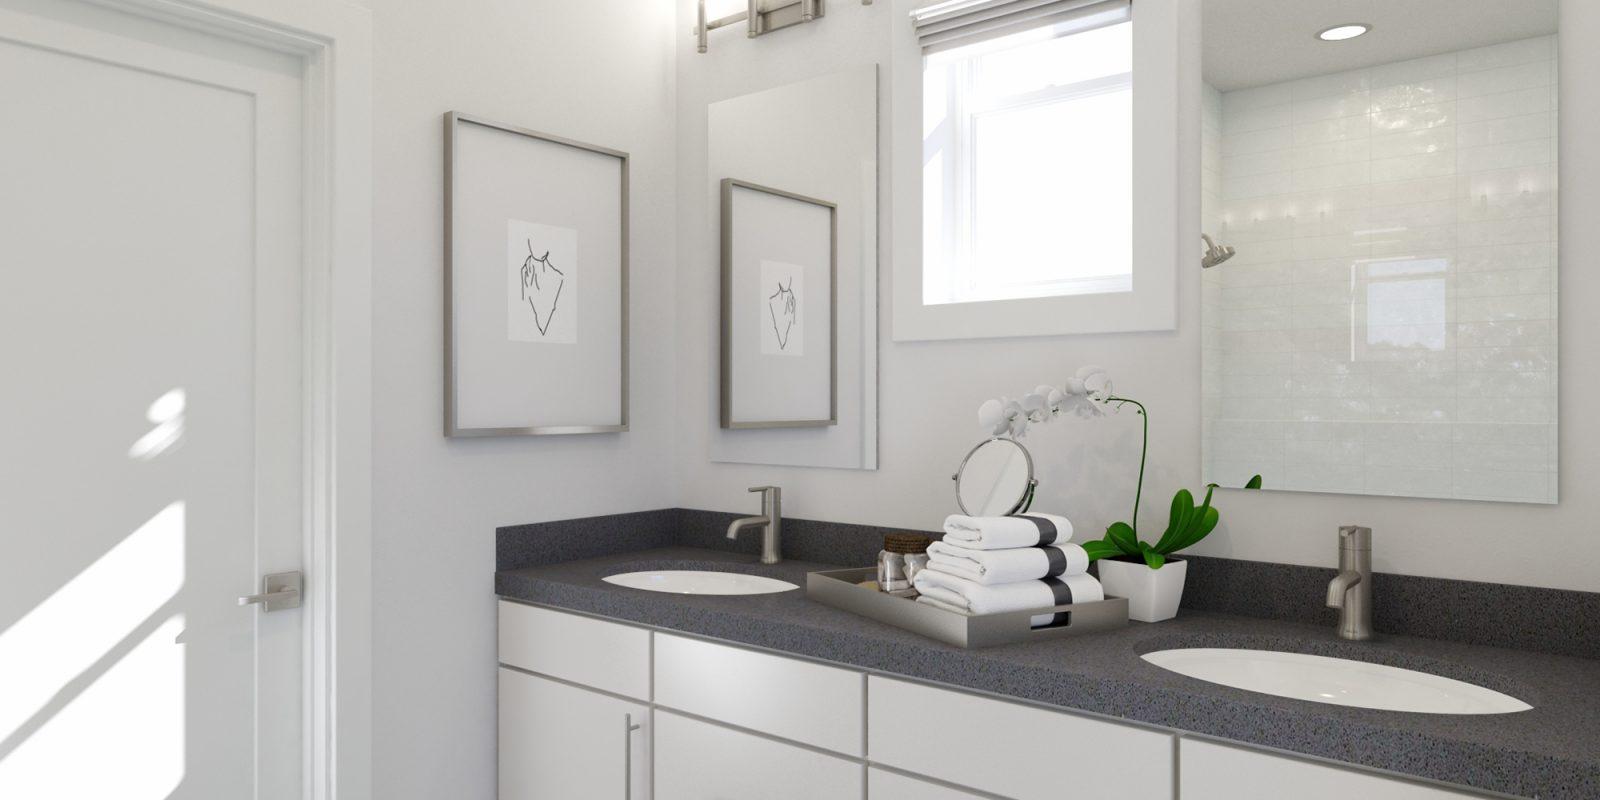 WestRidge DoMore Rows: Oasis - Master Bathroom